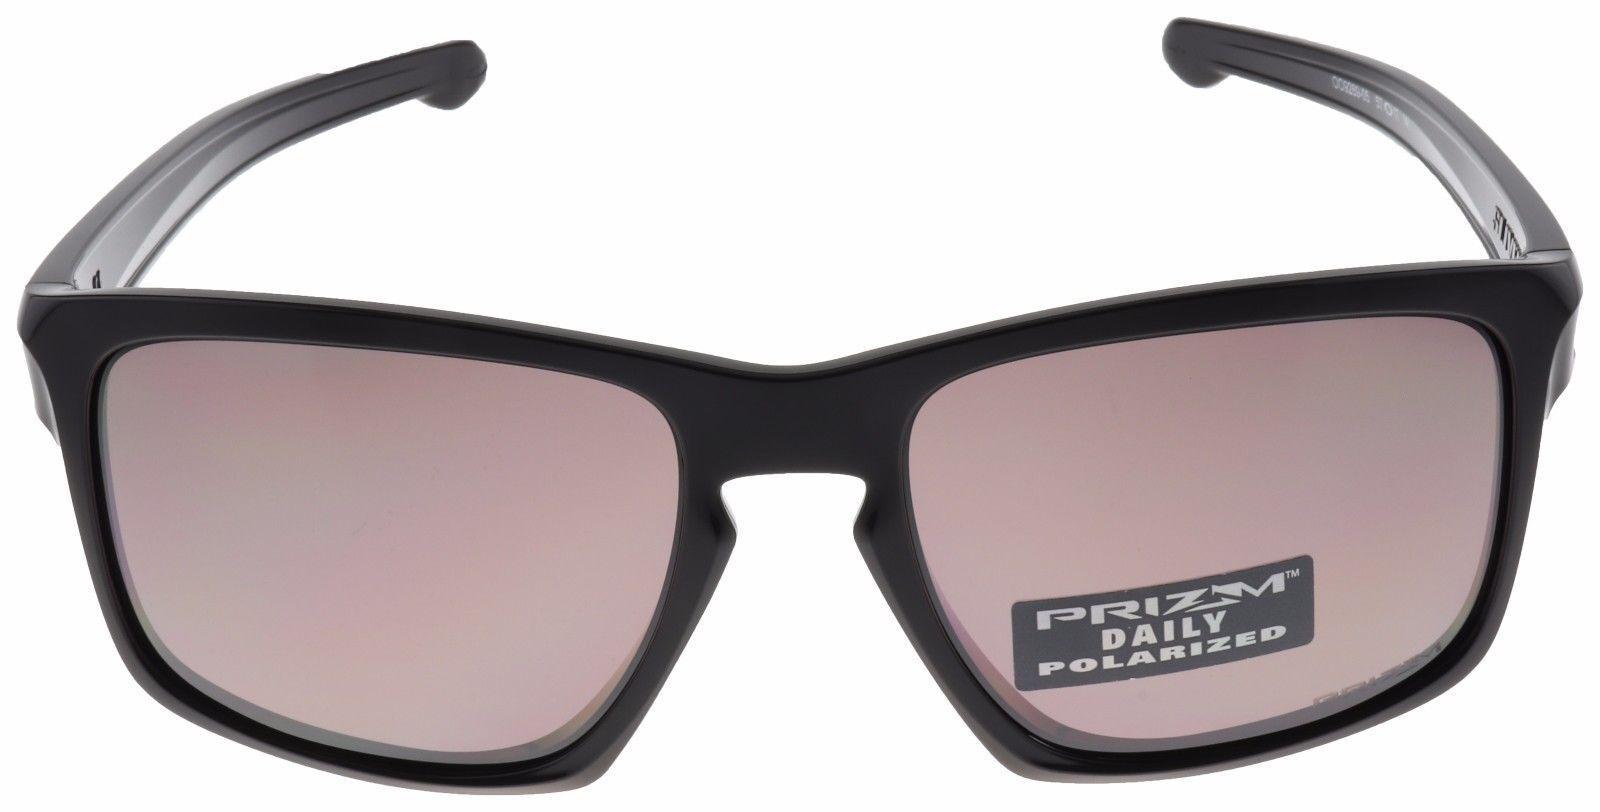 276c813f5a Oakley Sliver Sunglasses Oo9269-05 Polished Black W  Prizm Daily Polarized  Asia